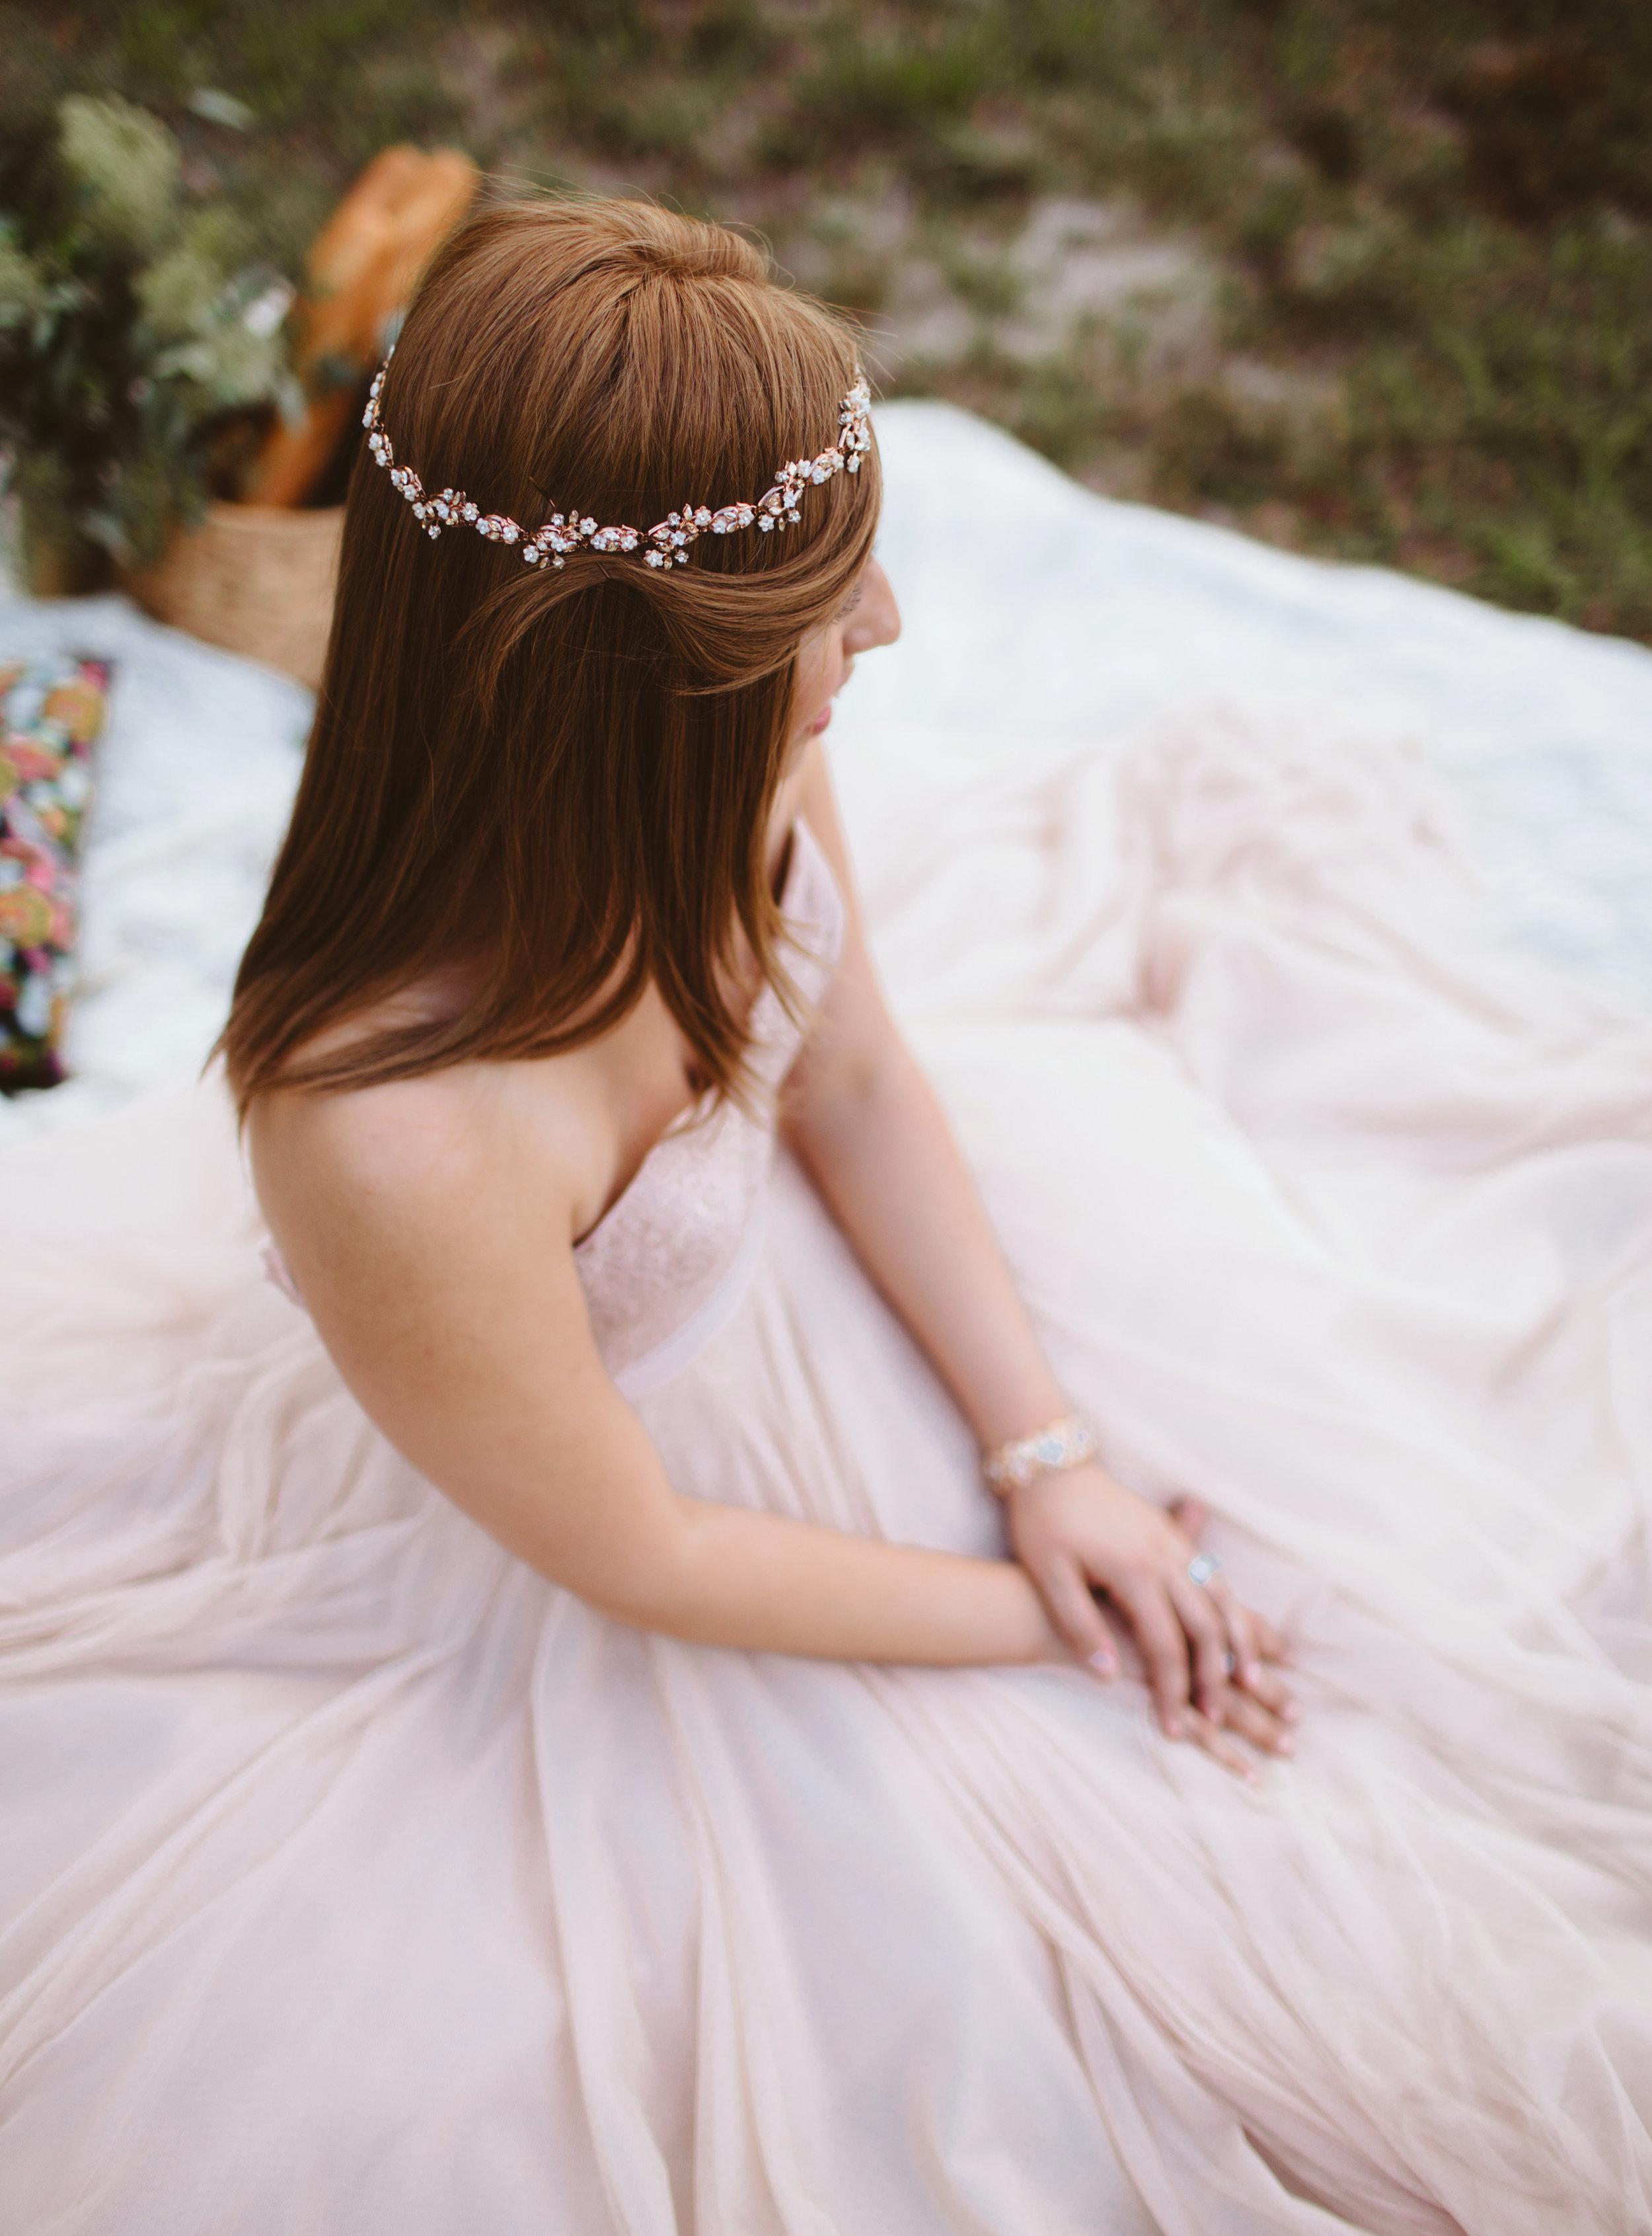 Breast Cancer awareness | Solutions bridal | Waterswoo | Vanessa Boy | vanessaboy.com |-413.com |final.jpg